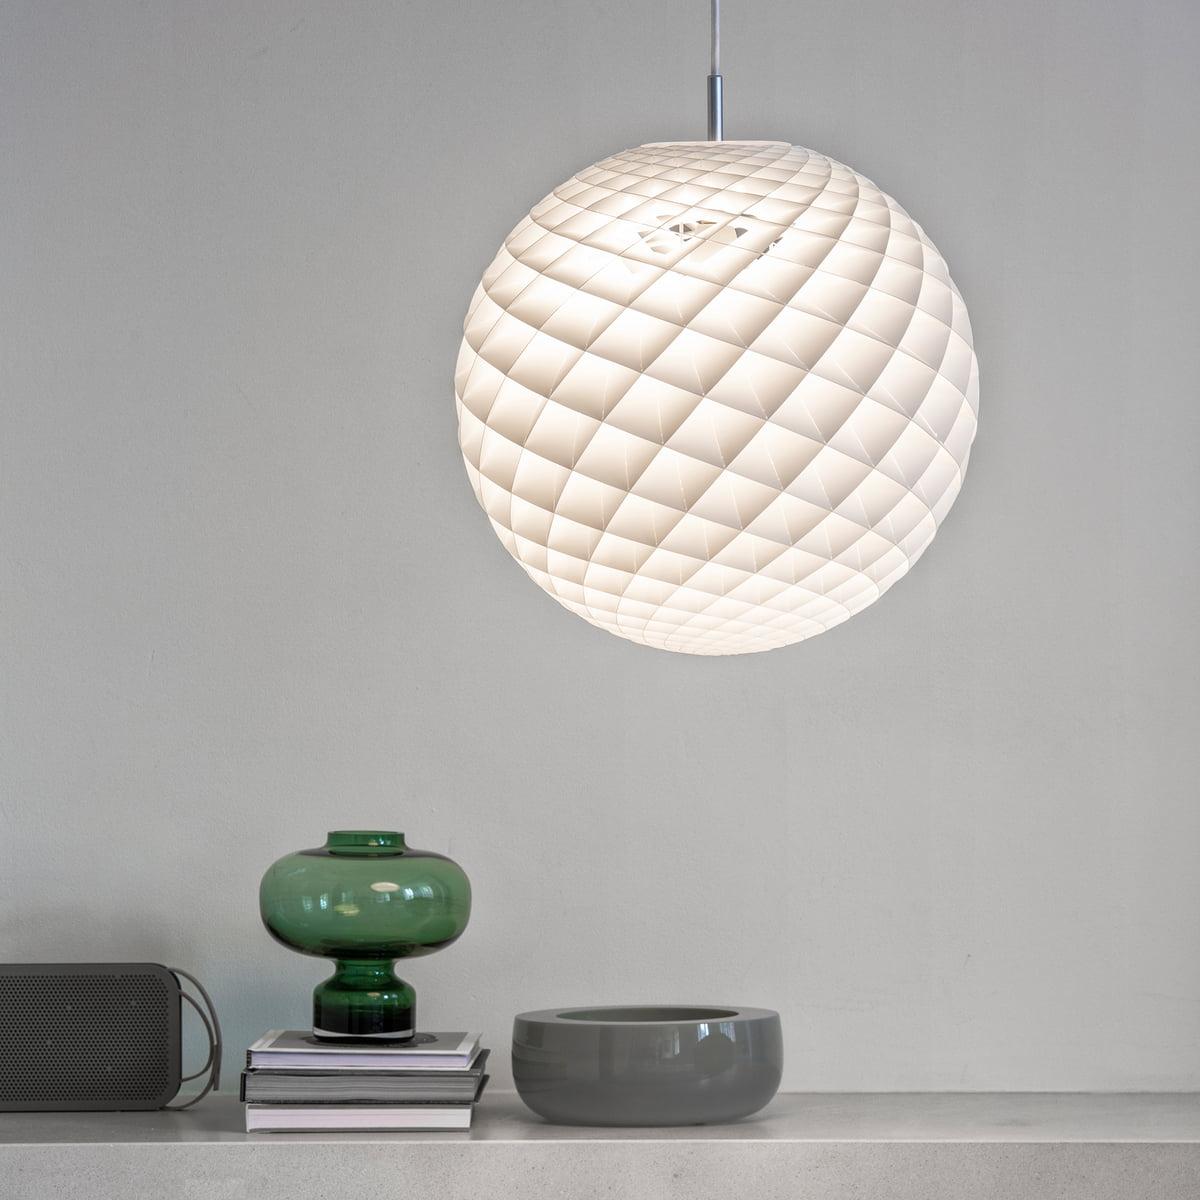 buy the patera pendant lamp by louis poulsen. Black Bedroom Furniture Sets. Home Design Ideas